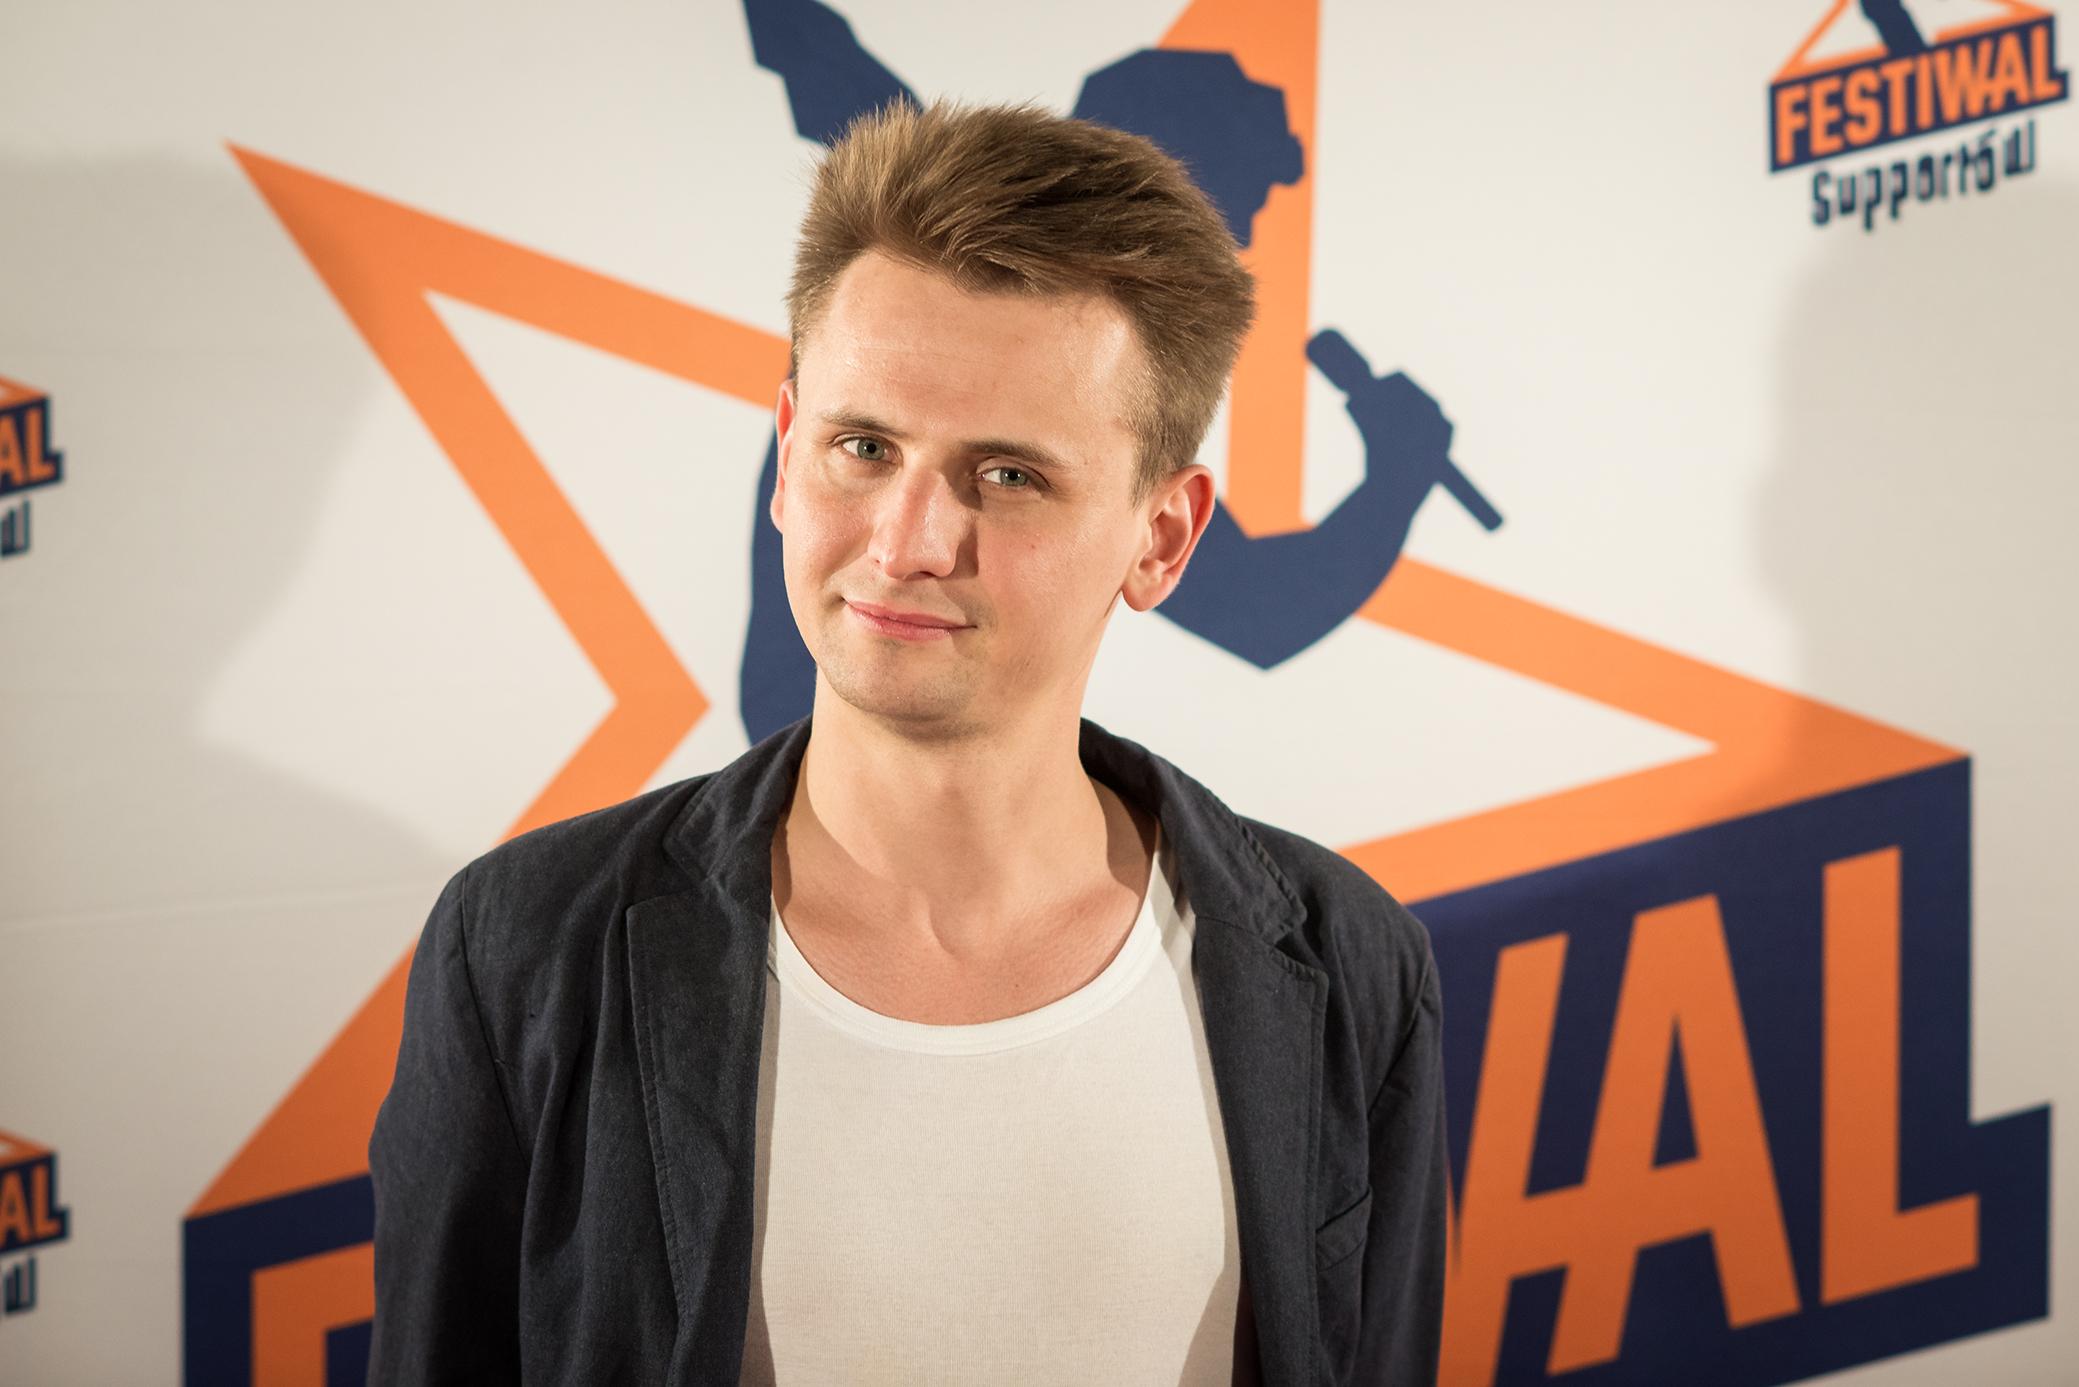 Jan Malski